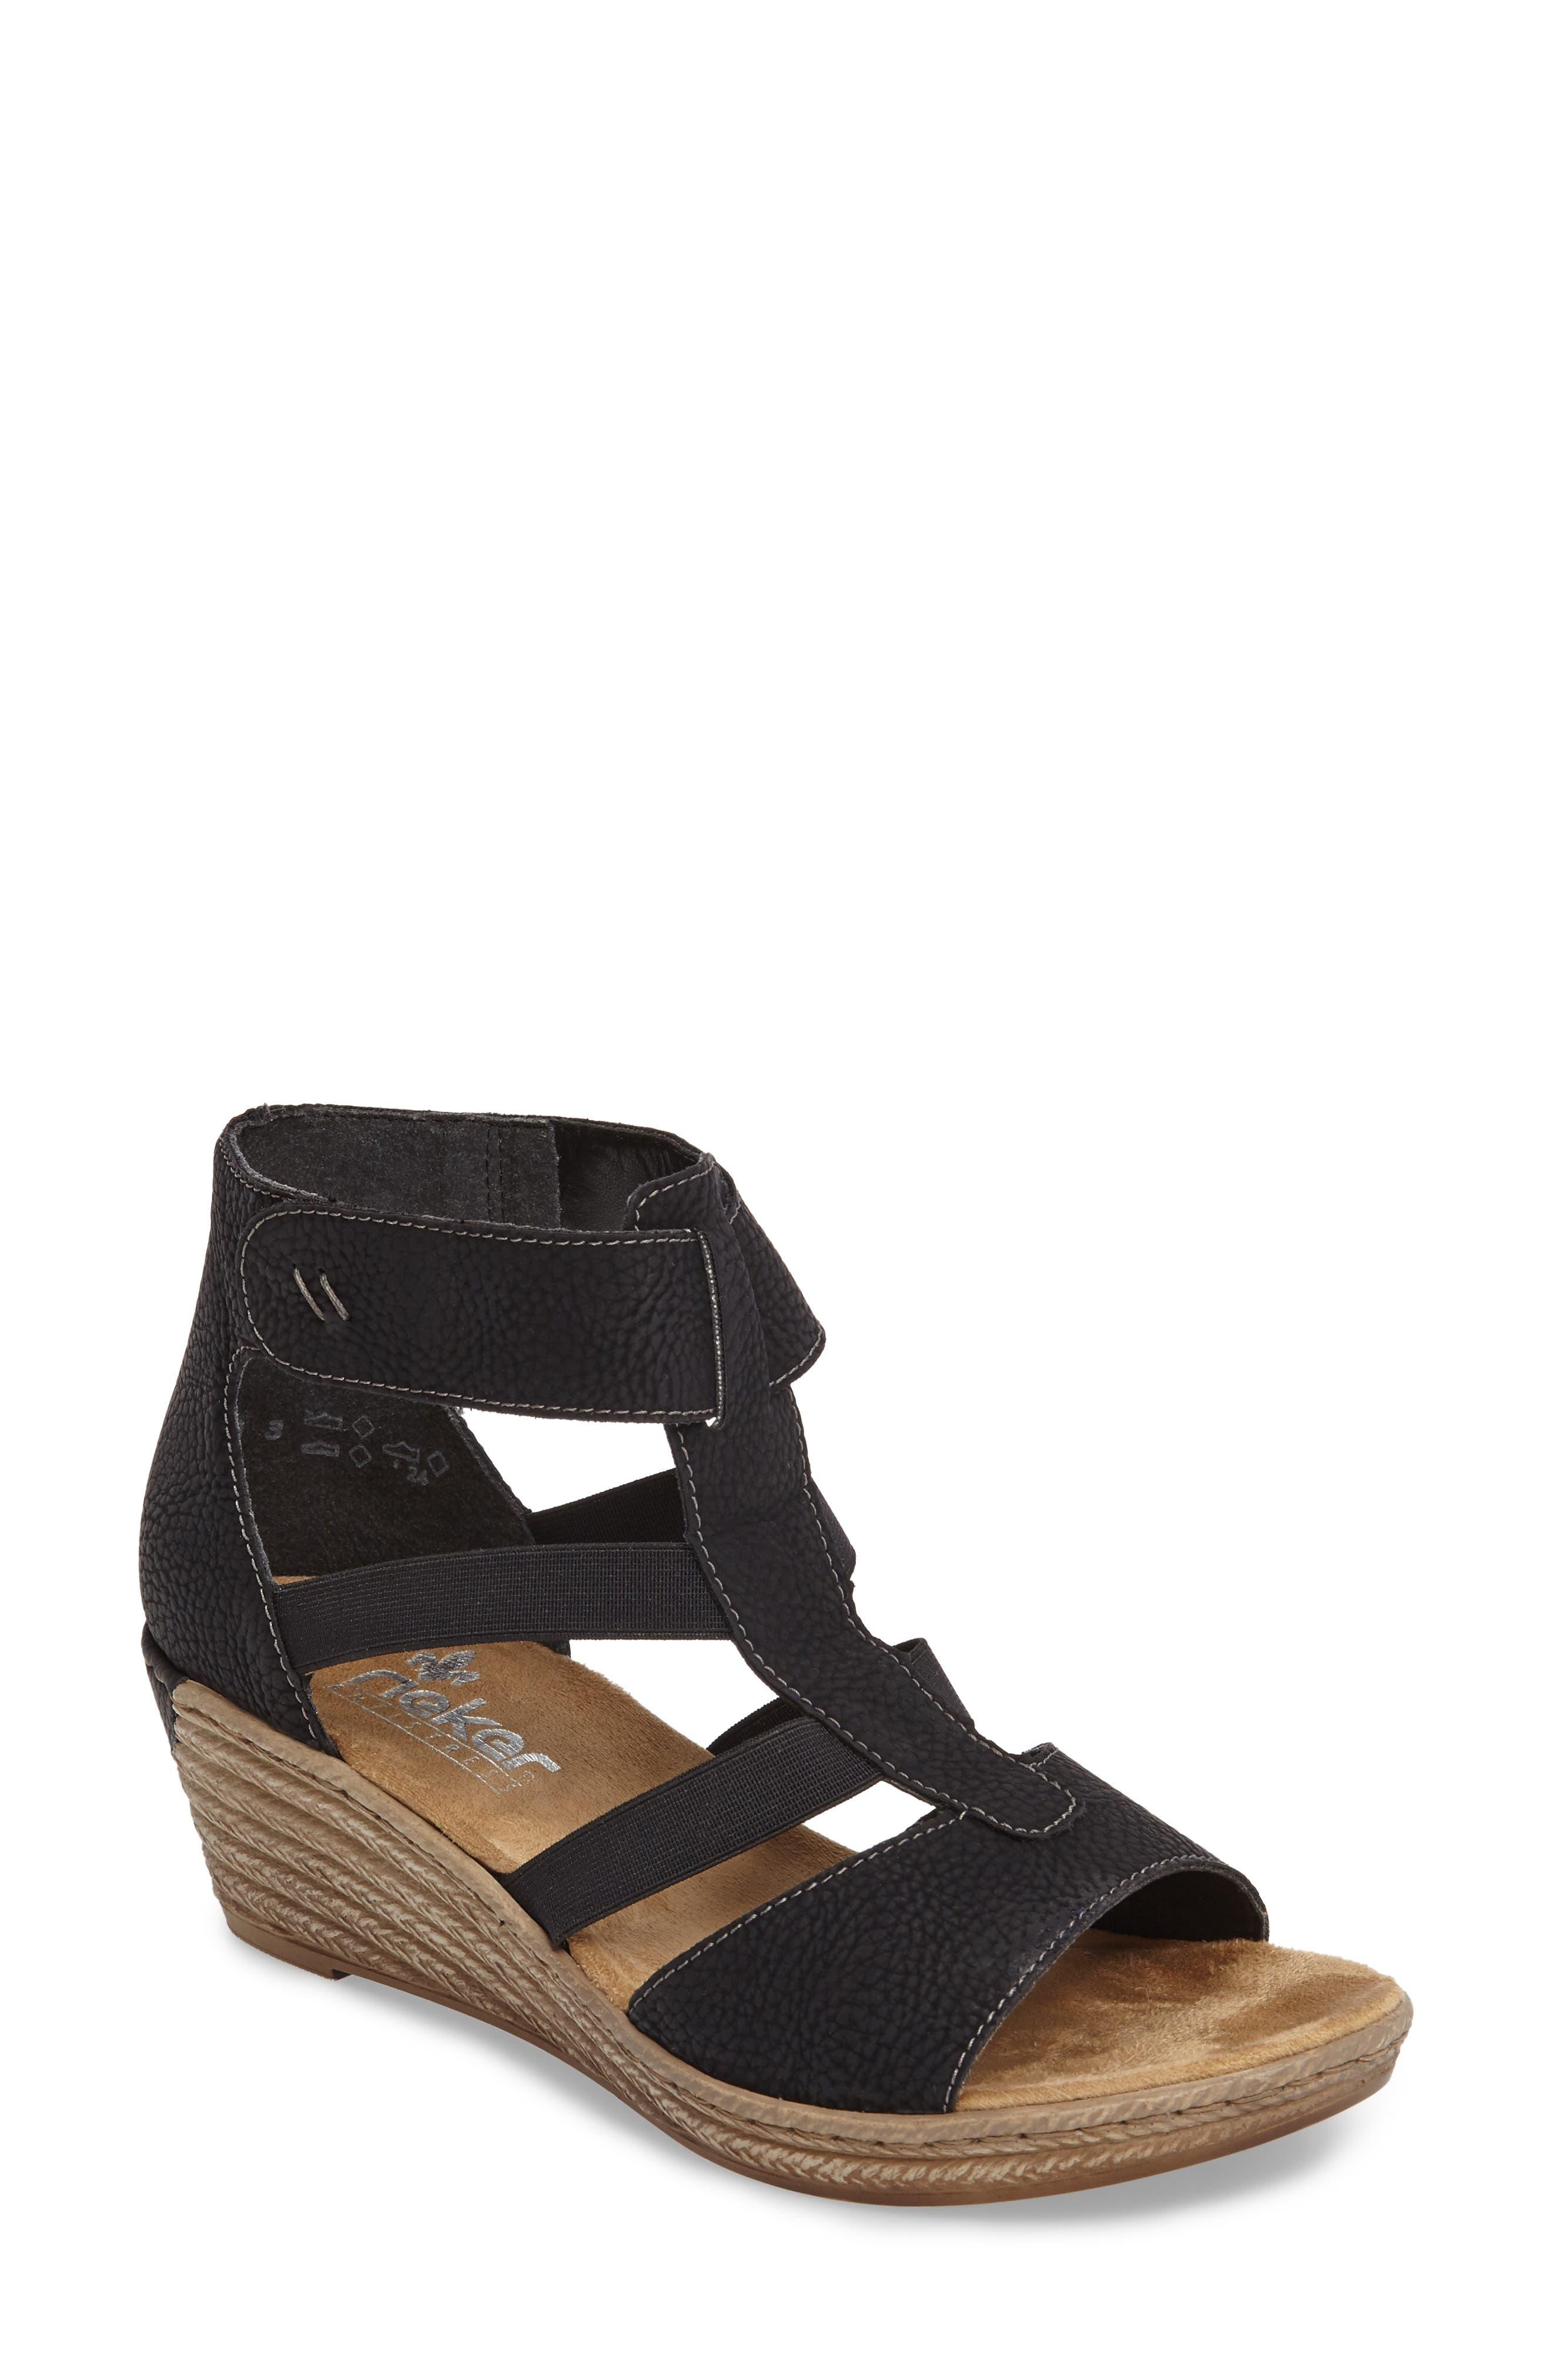 RIEKER ANTISTRESS Fanni 39 Wedge Sandal, Main, color, 001